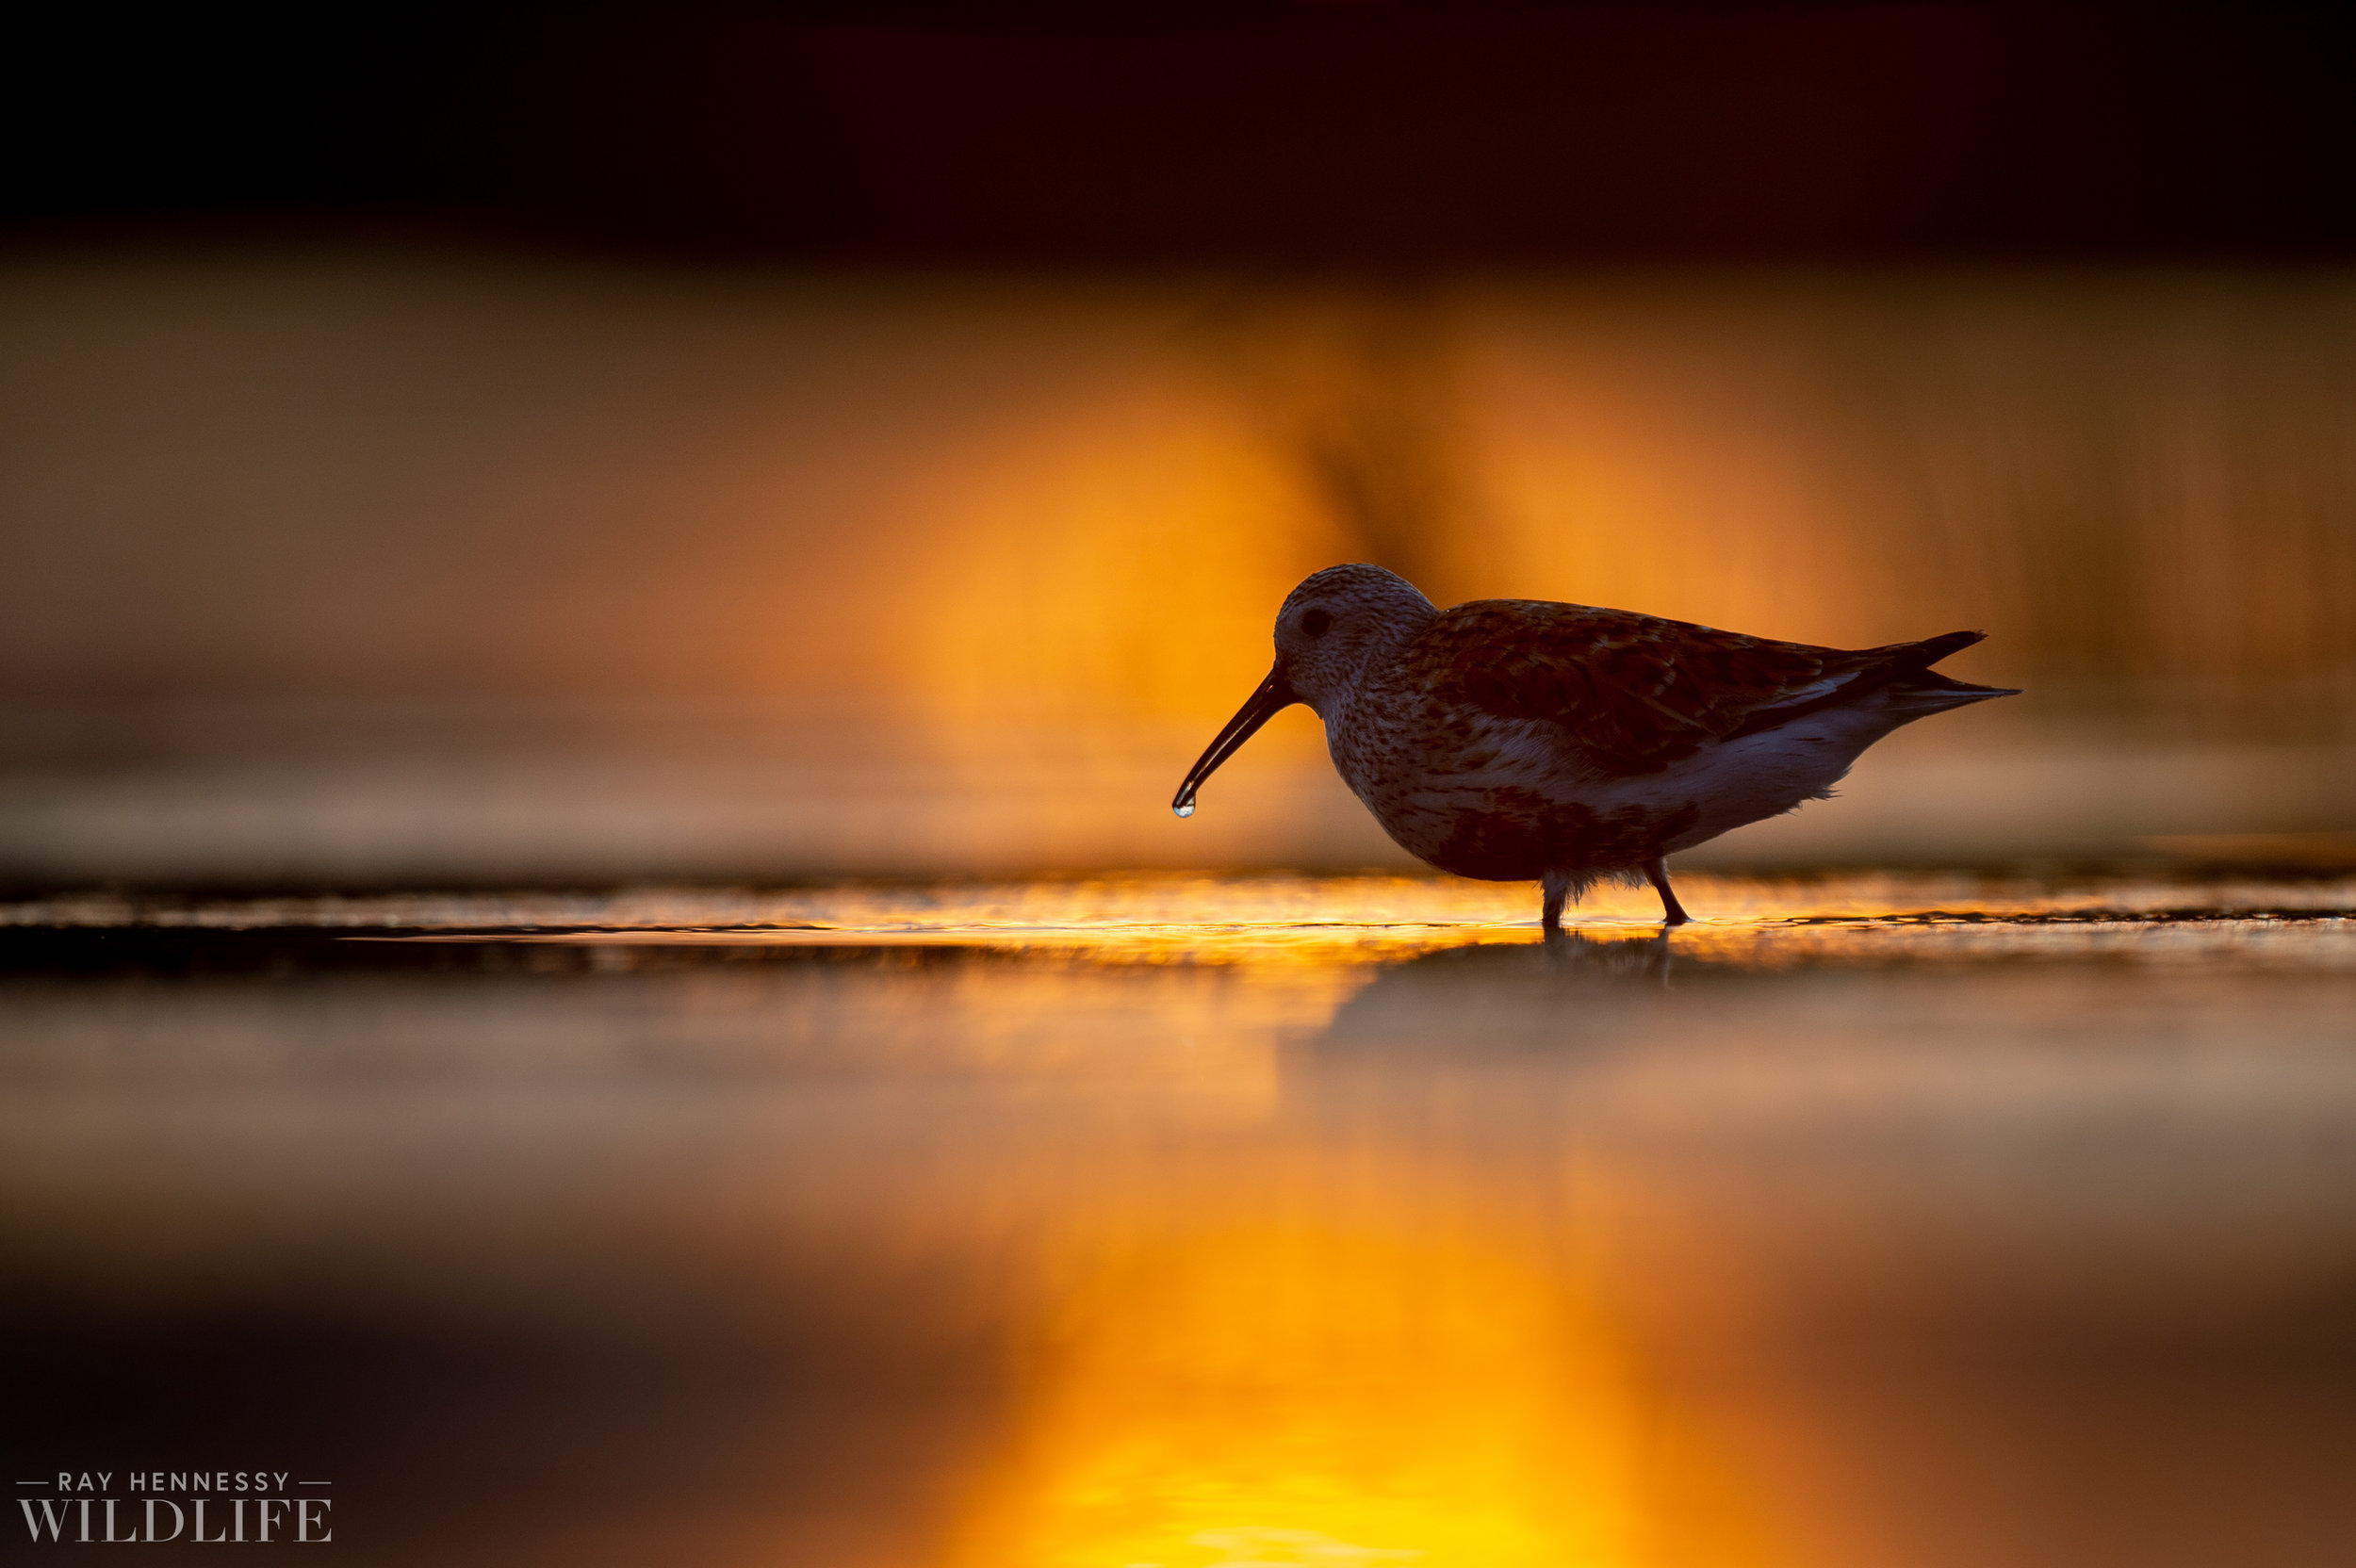 002_shorebirds-prothonotary-warbler.jpg